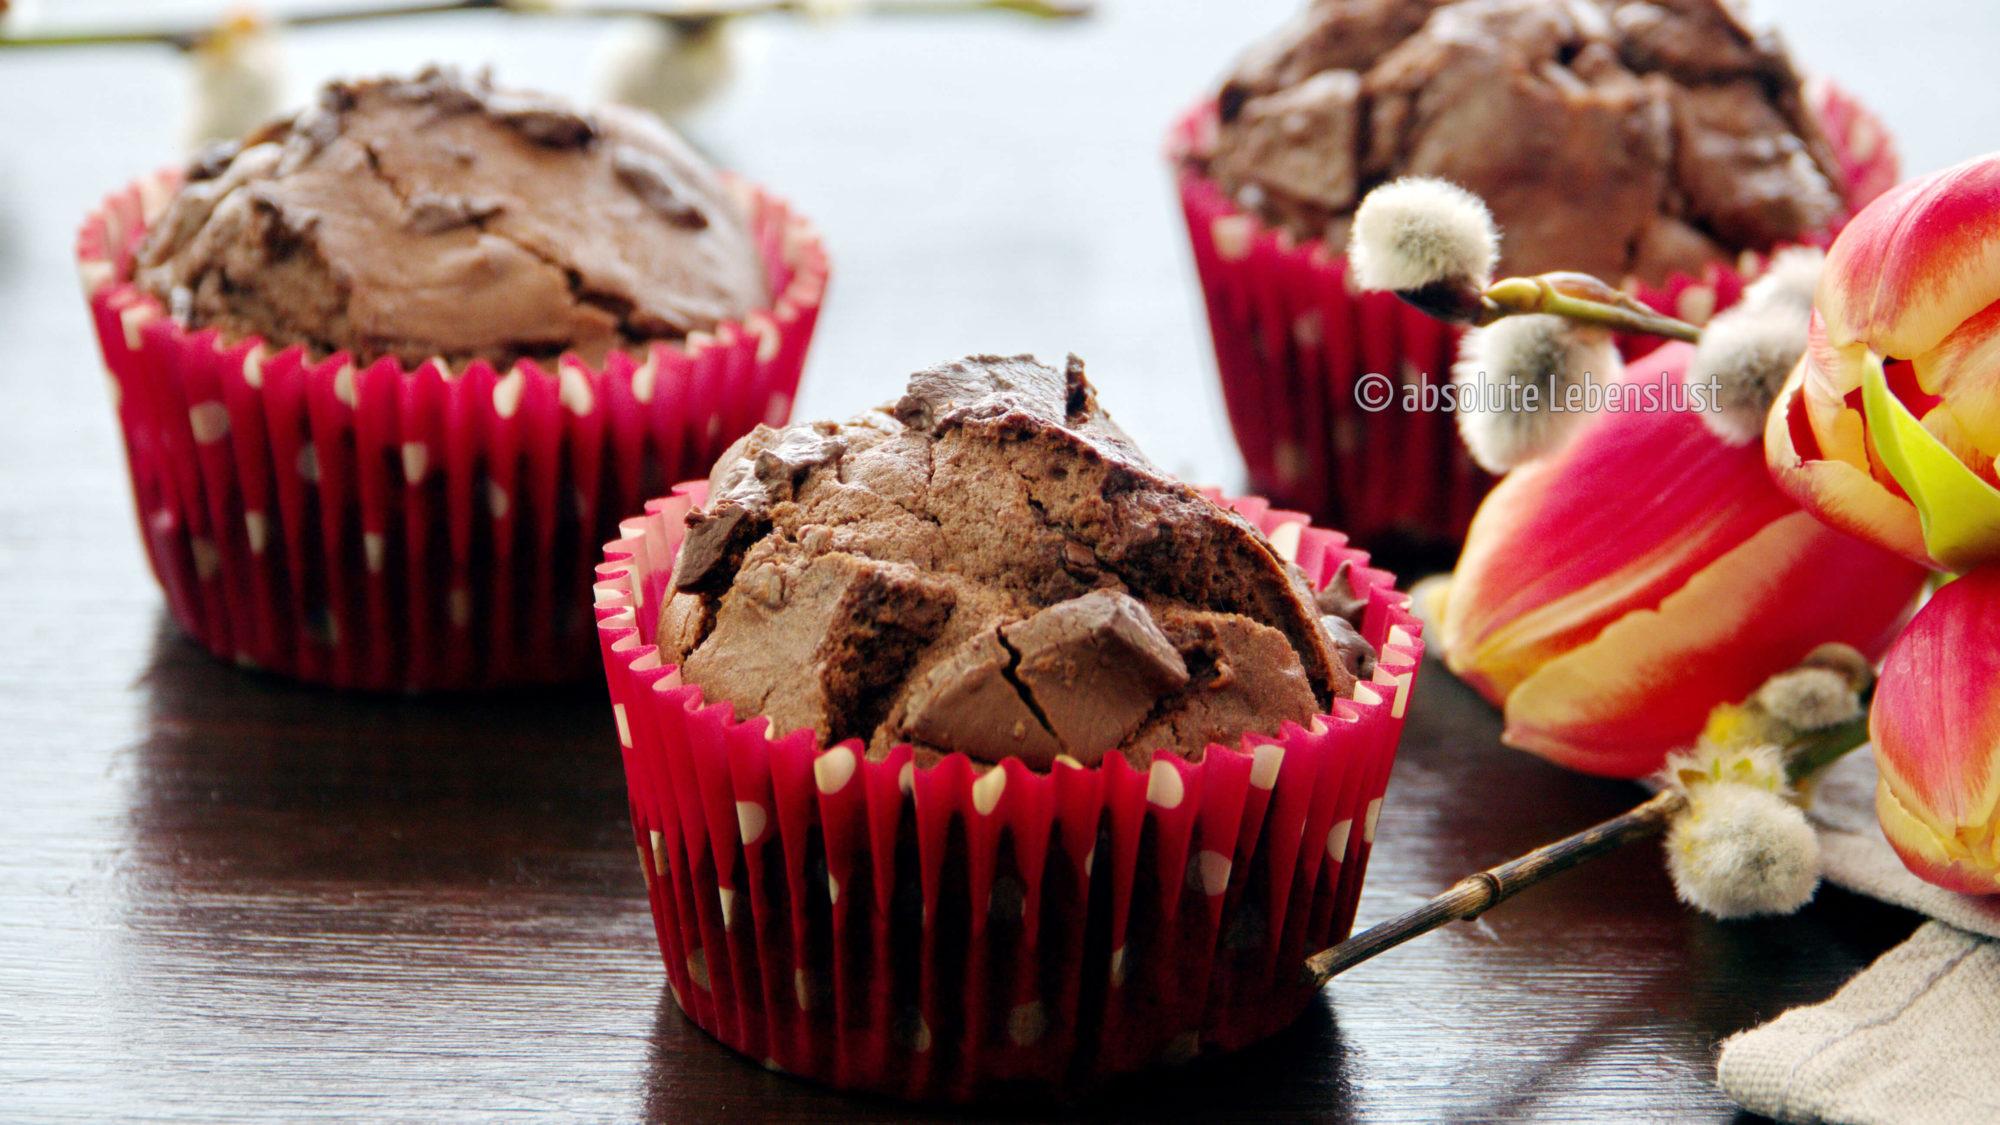 schokoladen muffins, muffins grundrezept, muffins grundteig, schokostücke, schoko muffins backen, muffins rezepte